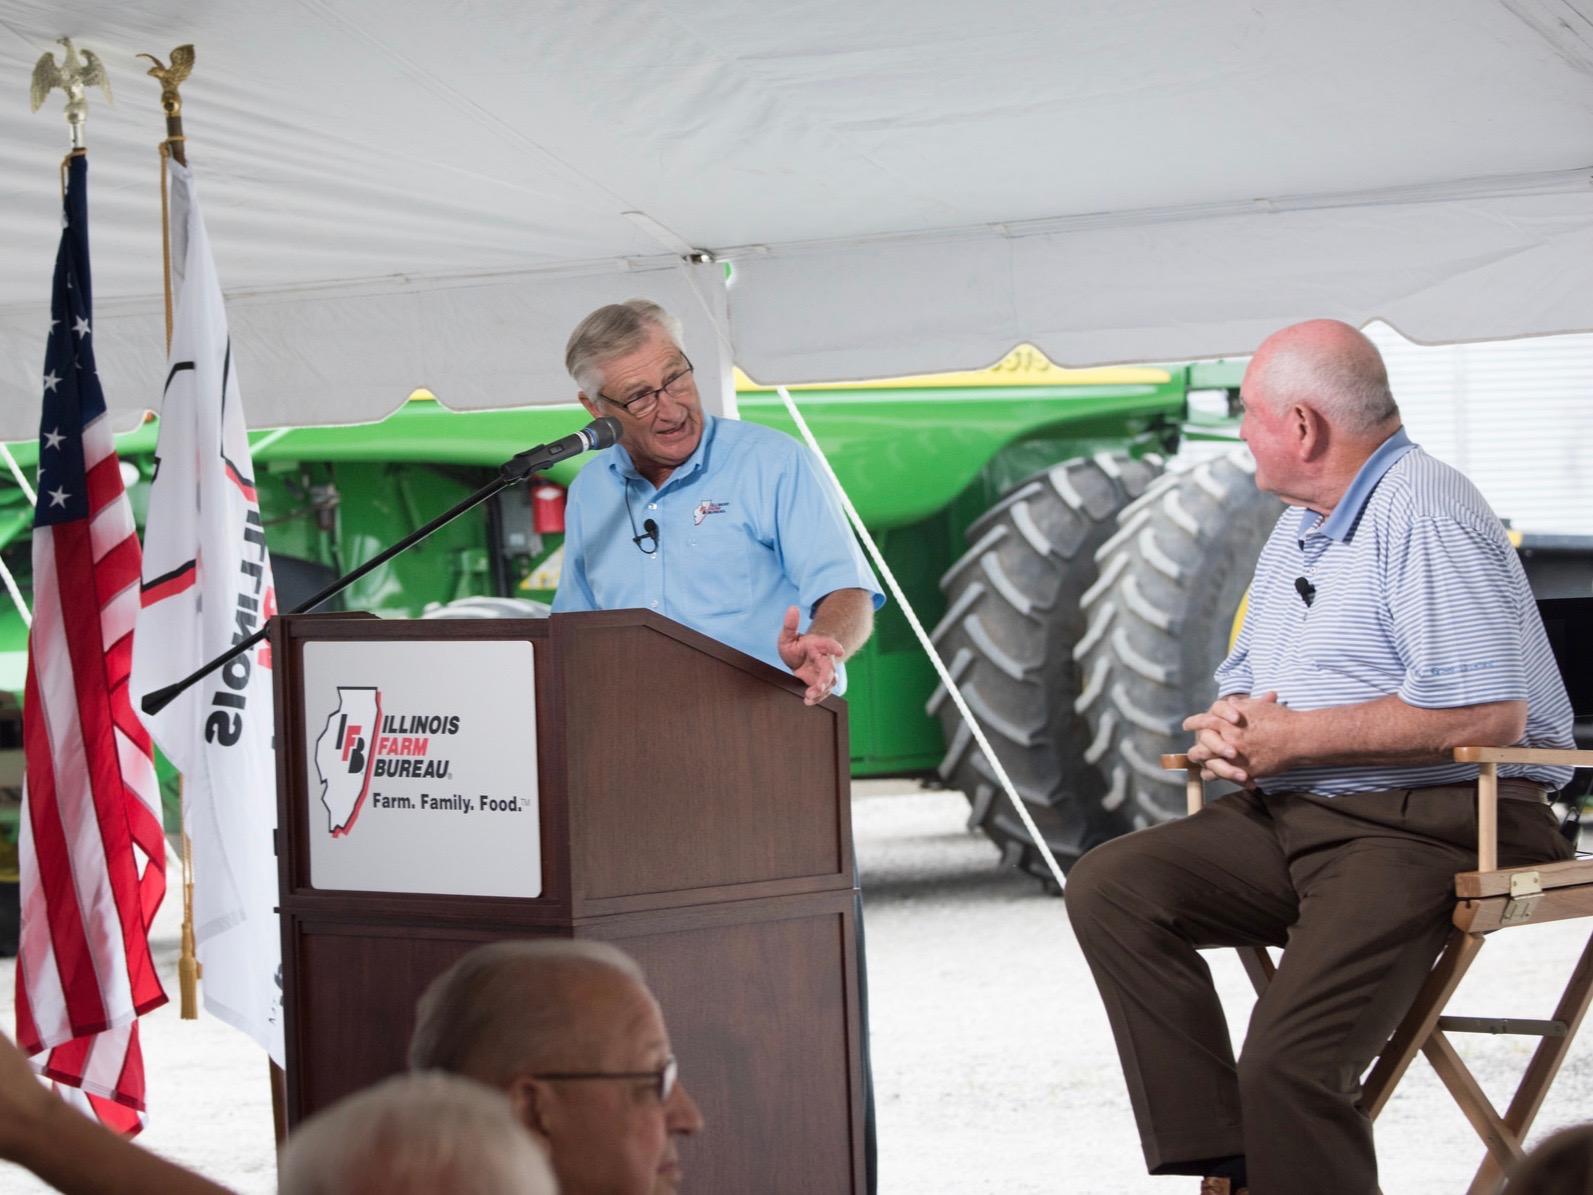 Illinois Farm Bureau President Richard Guebert Jr. and USDA Secretary Sonny Perdue talk at a 2017 event in Rochester. (USDA/Lance Cheung)